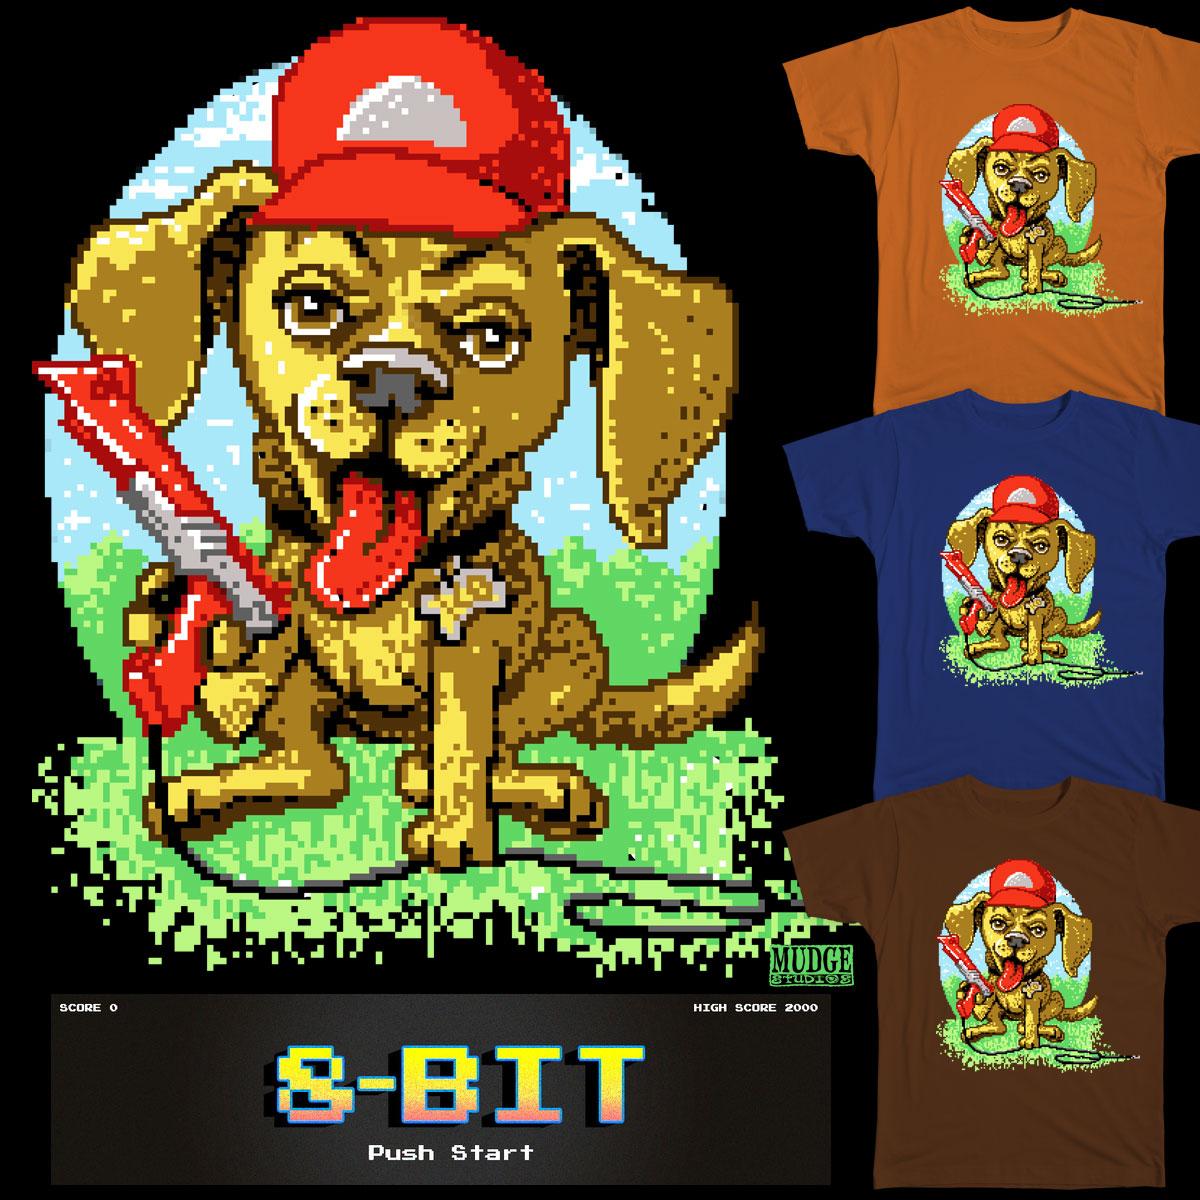 8-Bit Duck Hunting Pup by MudgeStudios on Threadless